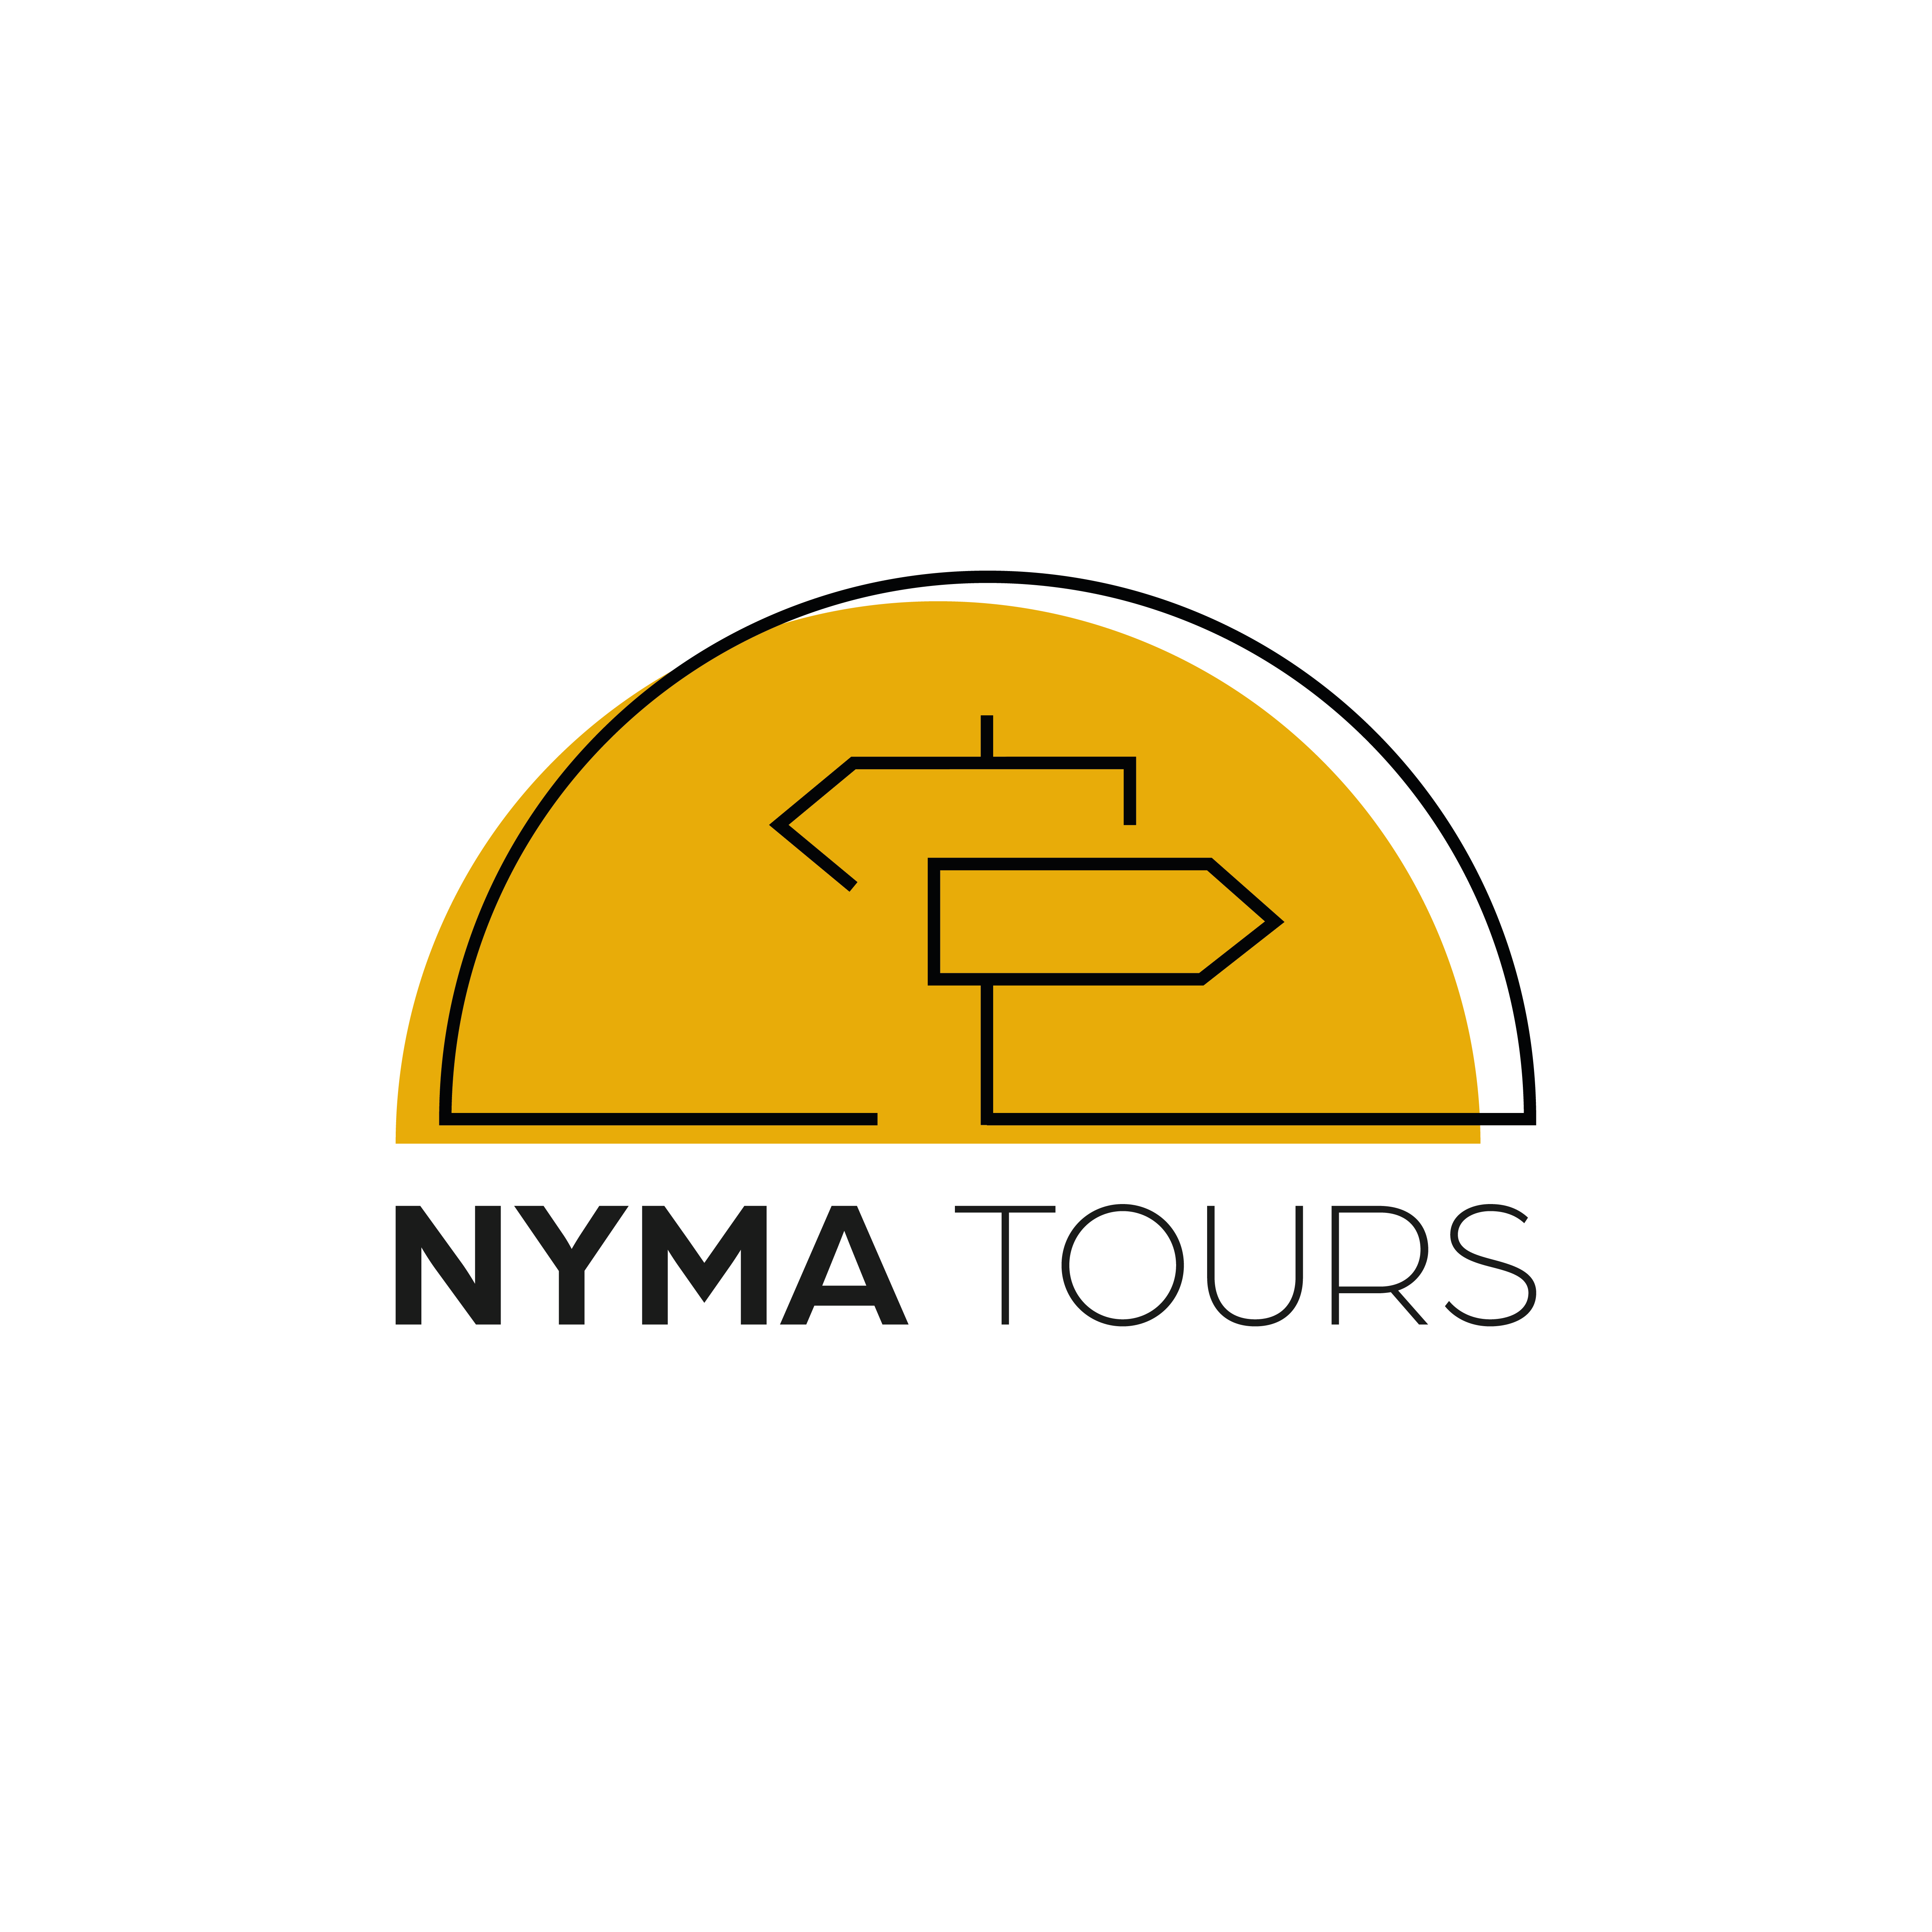 Nyma_Tour_Haarlem